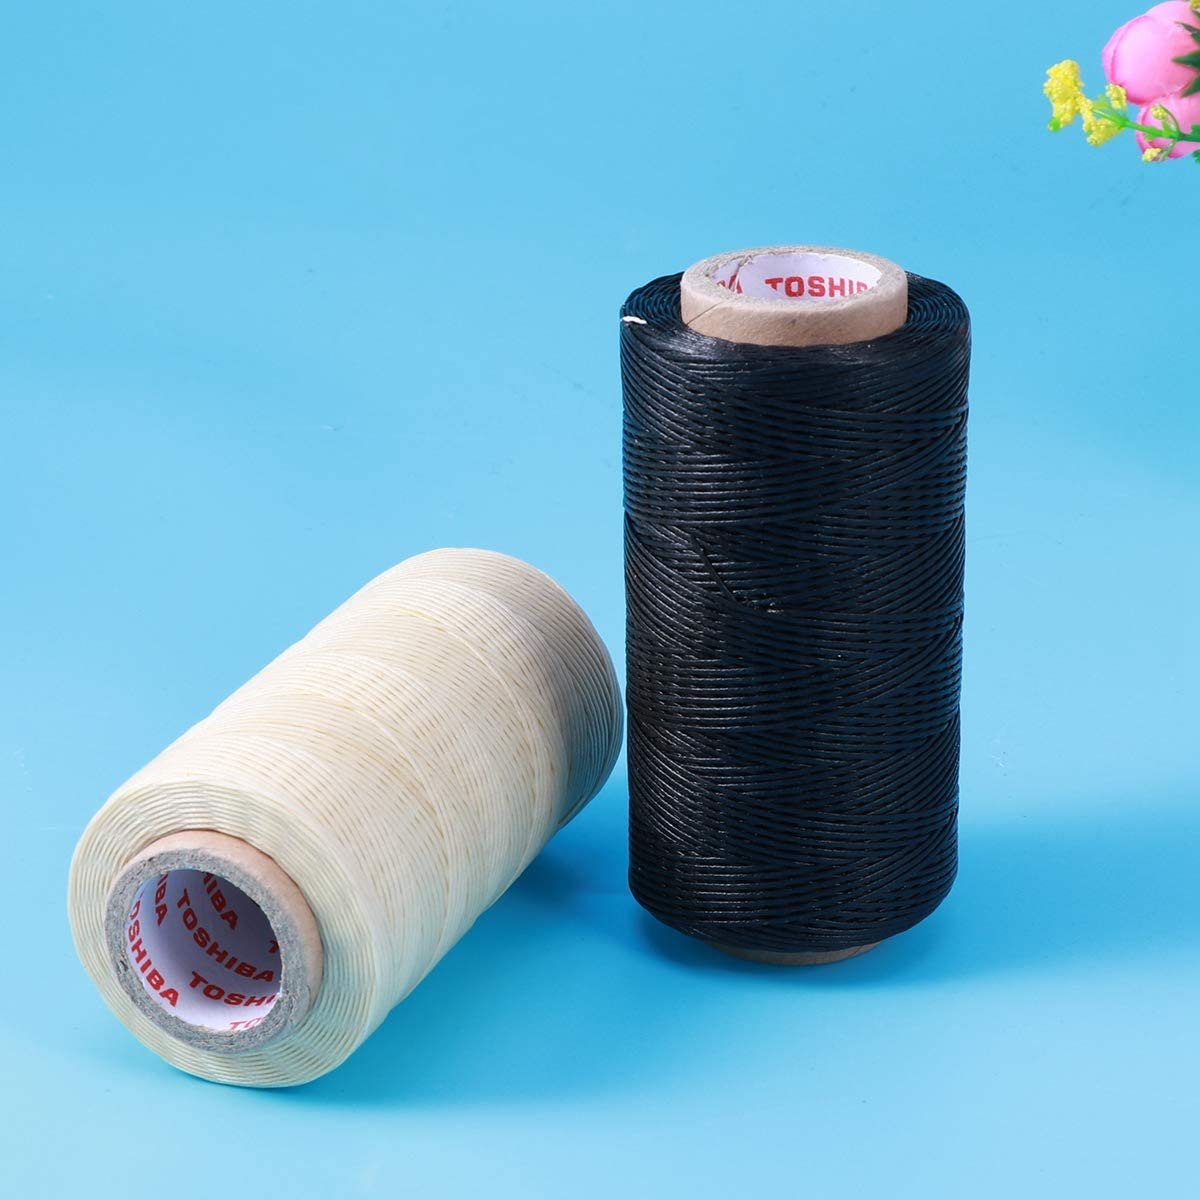 SUPXOV 2XS 150D 1mm Waxed Cord DIY Wax String Accessories Craft Tool Thread Wax Line f/ür Moms Home Use Girls Family